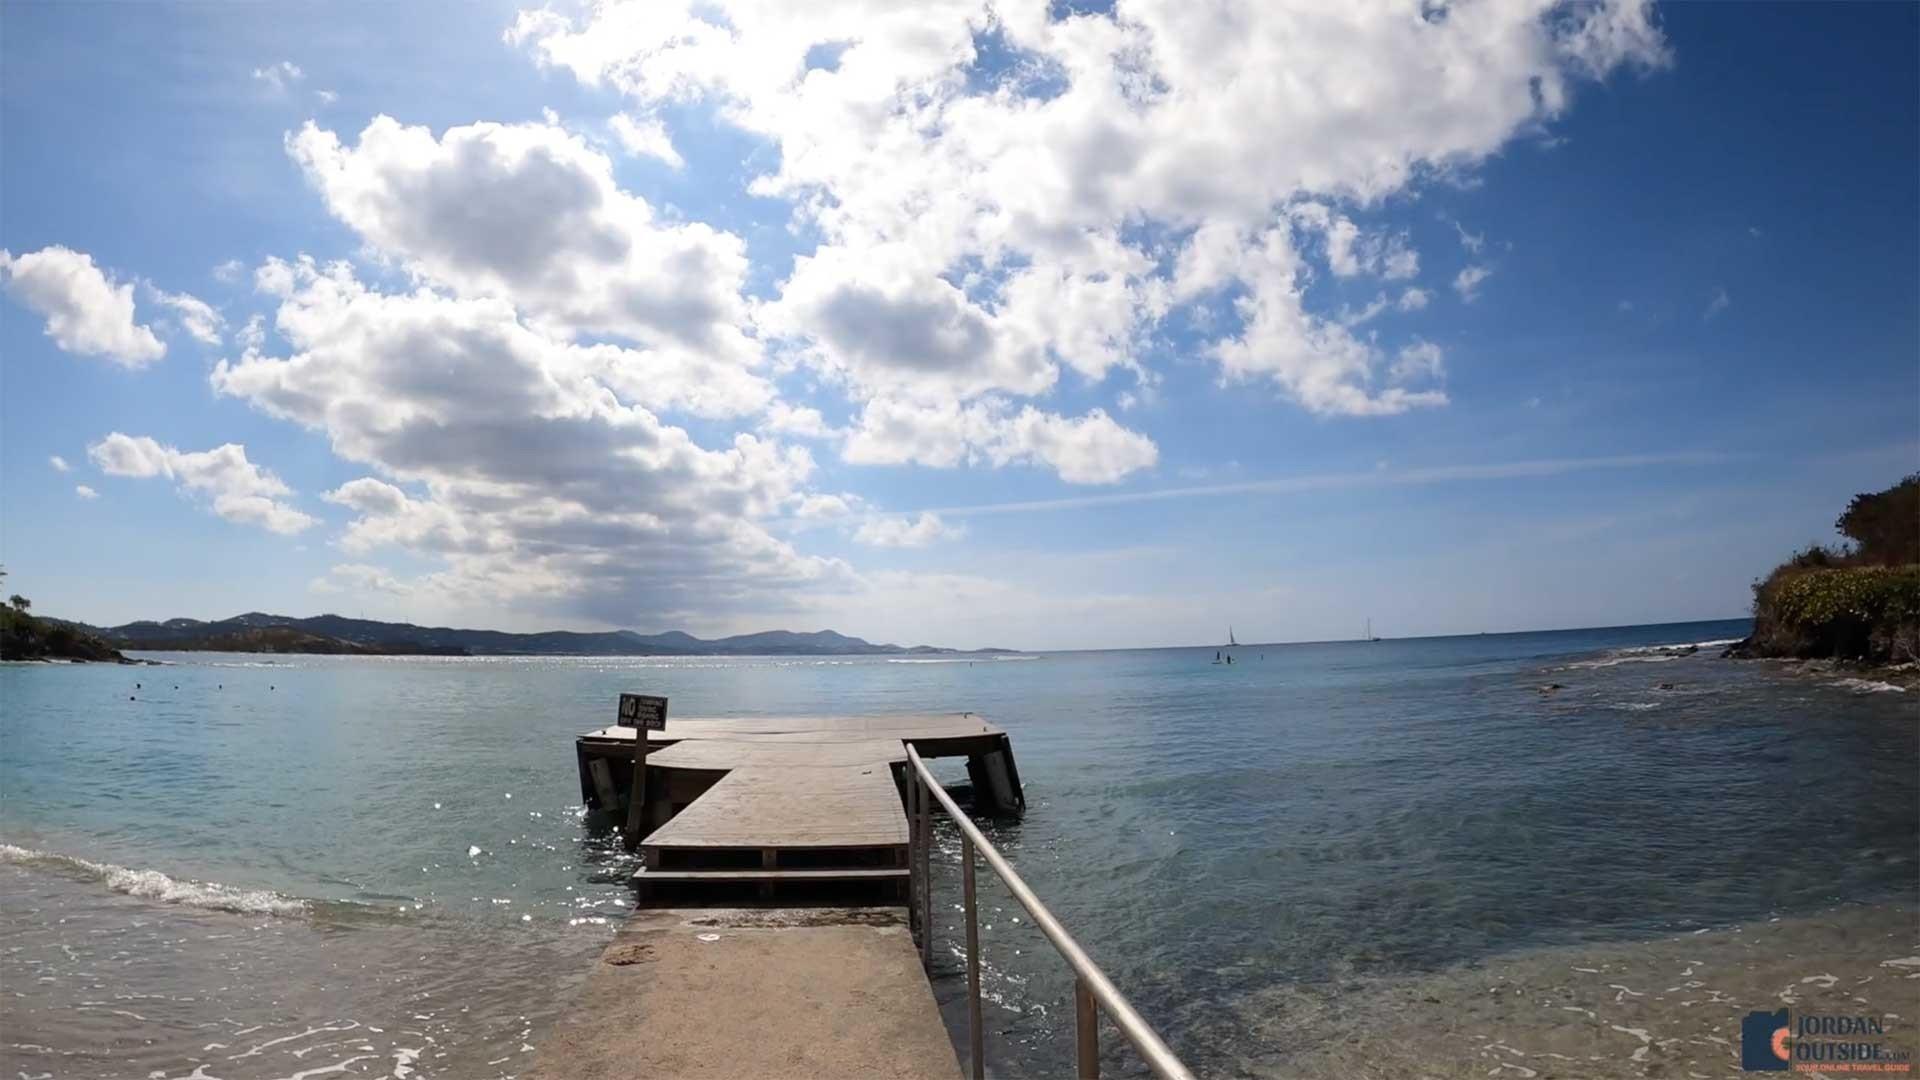 Mermaid Beach dock